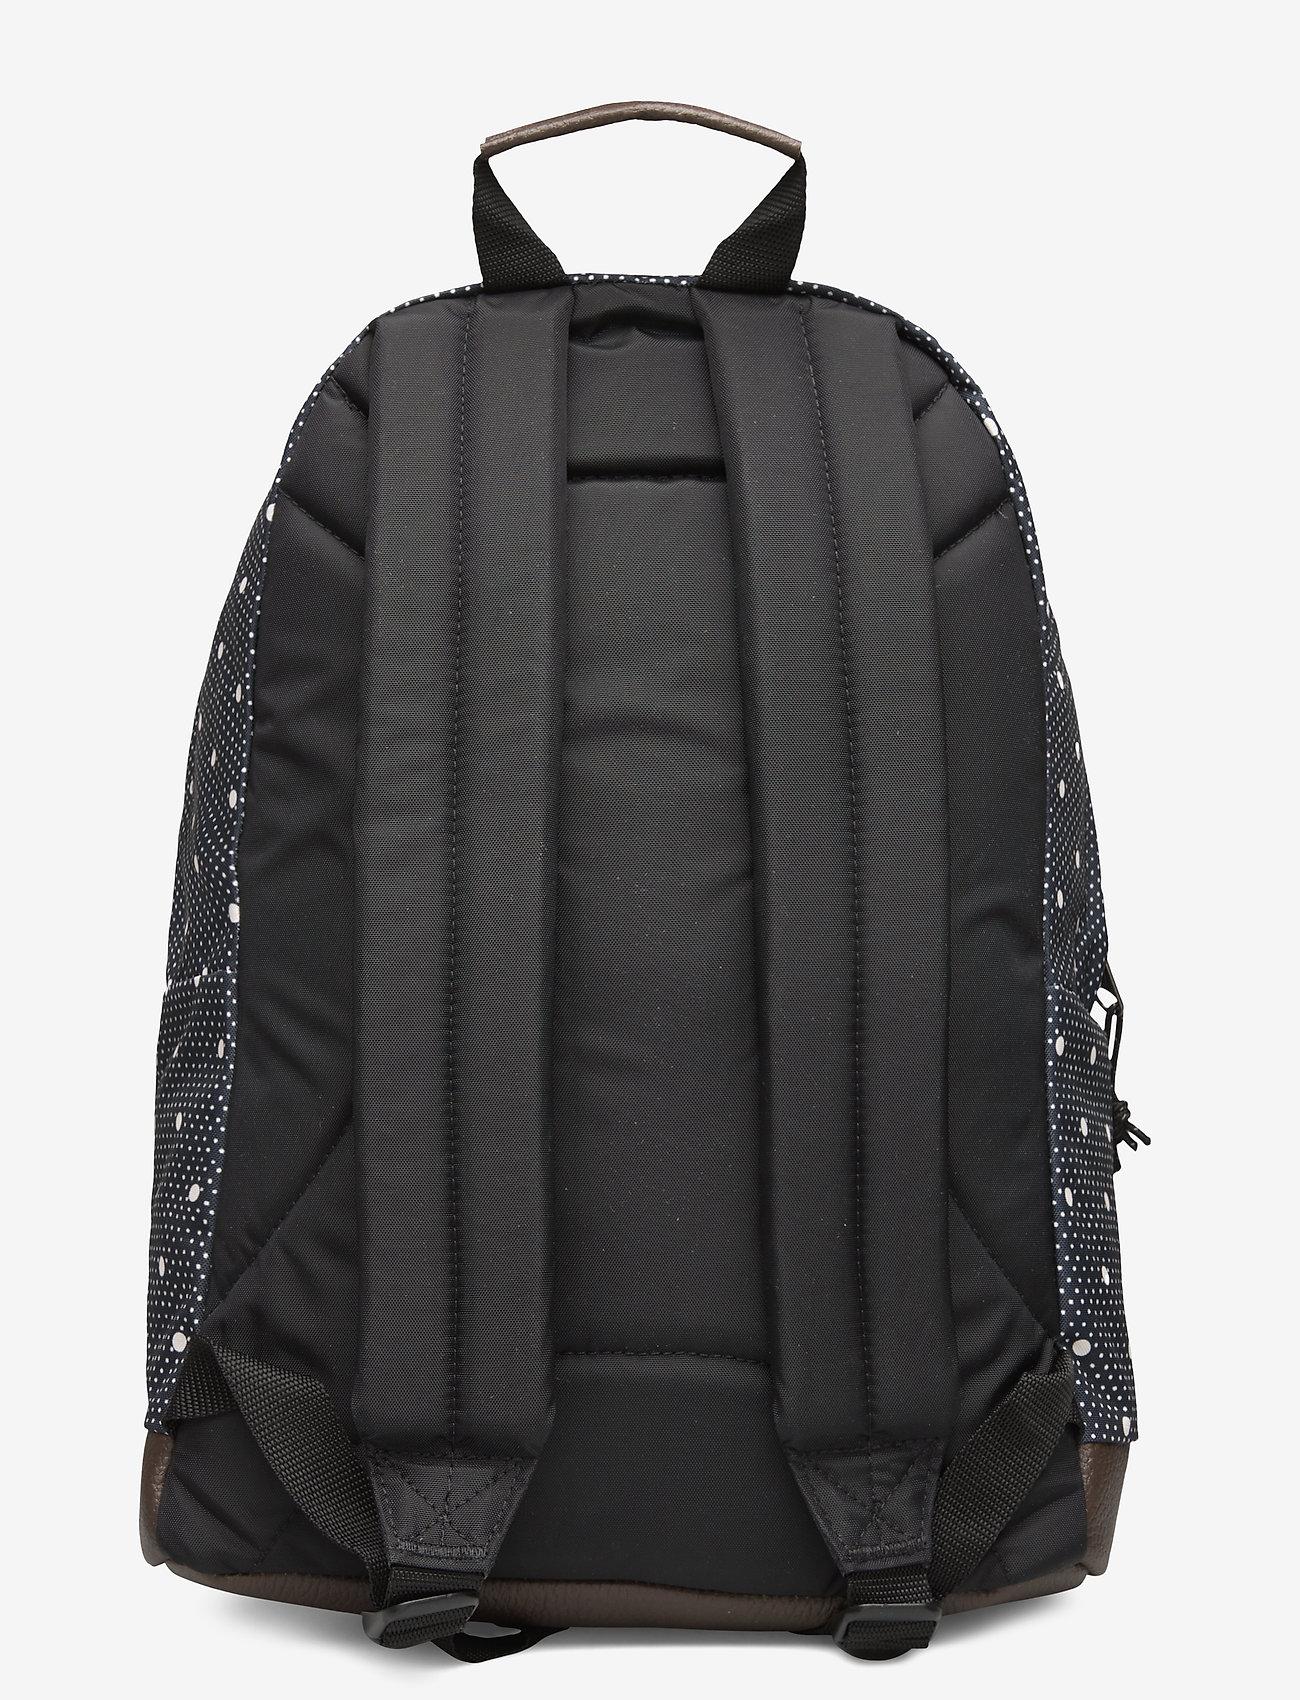 Eastpak - WYOMING - ryggsäckar - little dot - 1